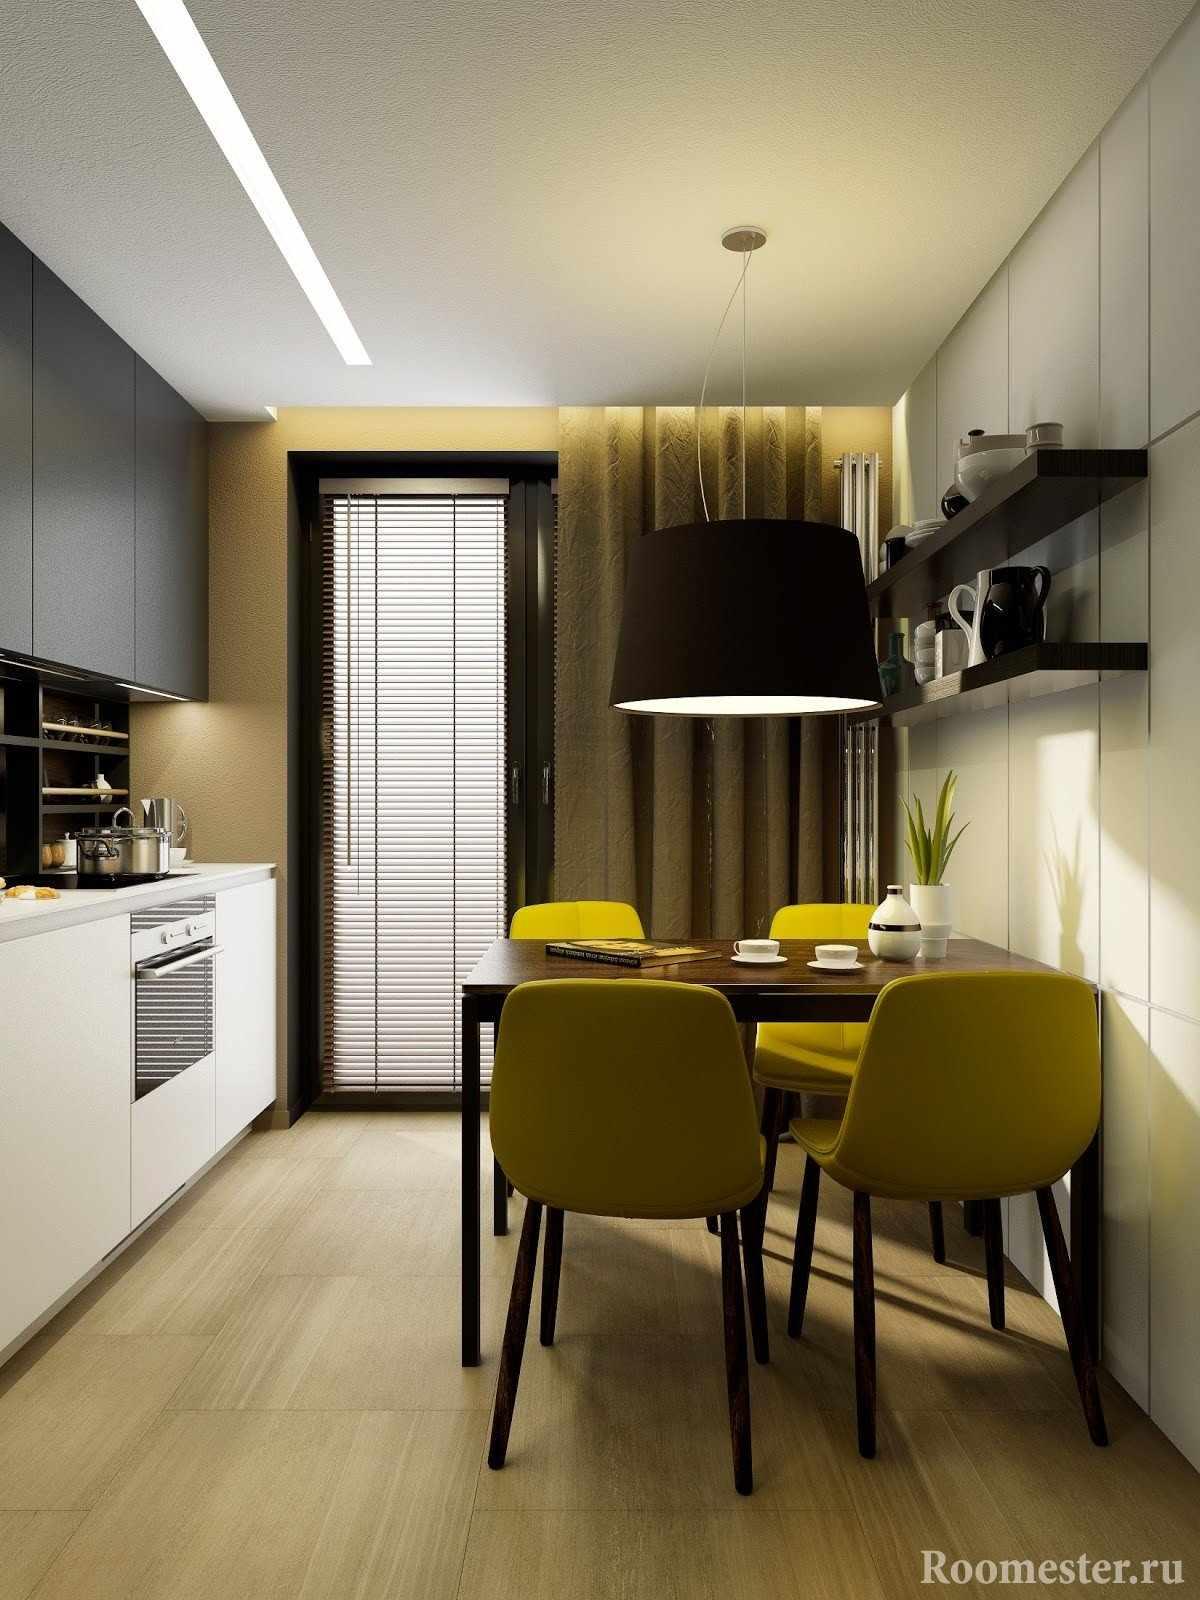 Желтые стулья на кухне